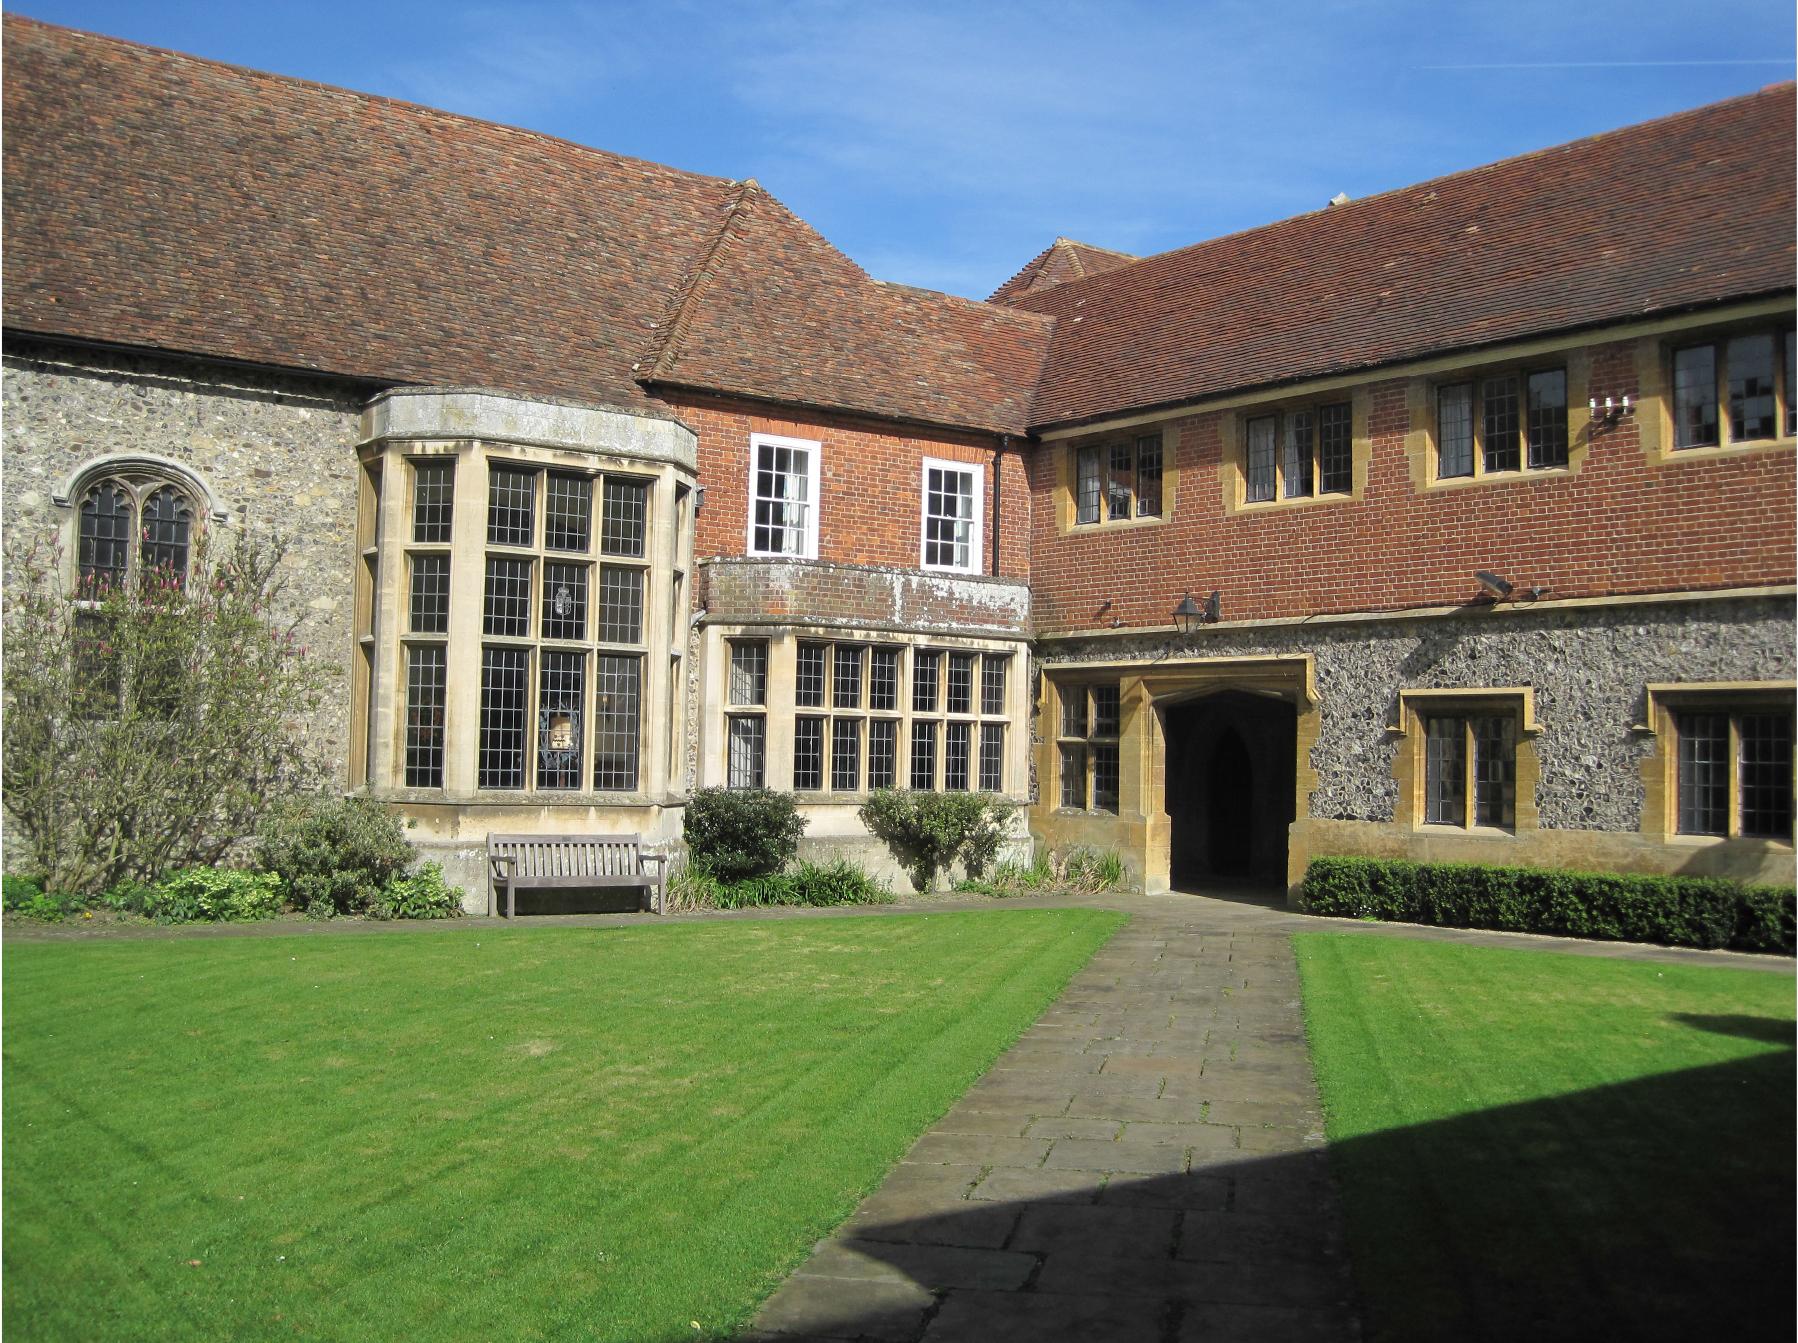 Wye College photos-5.jpg